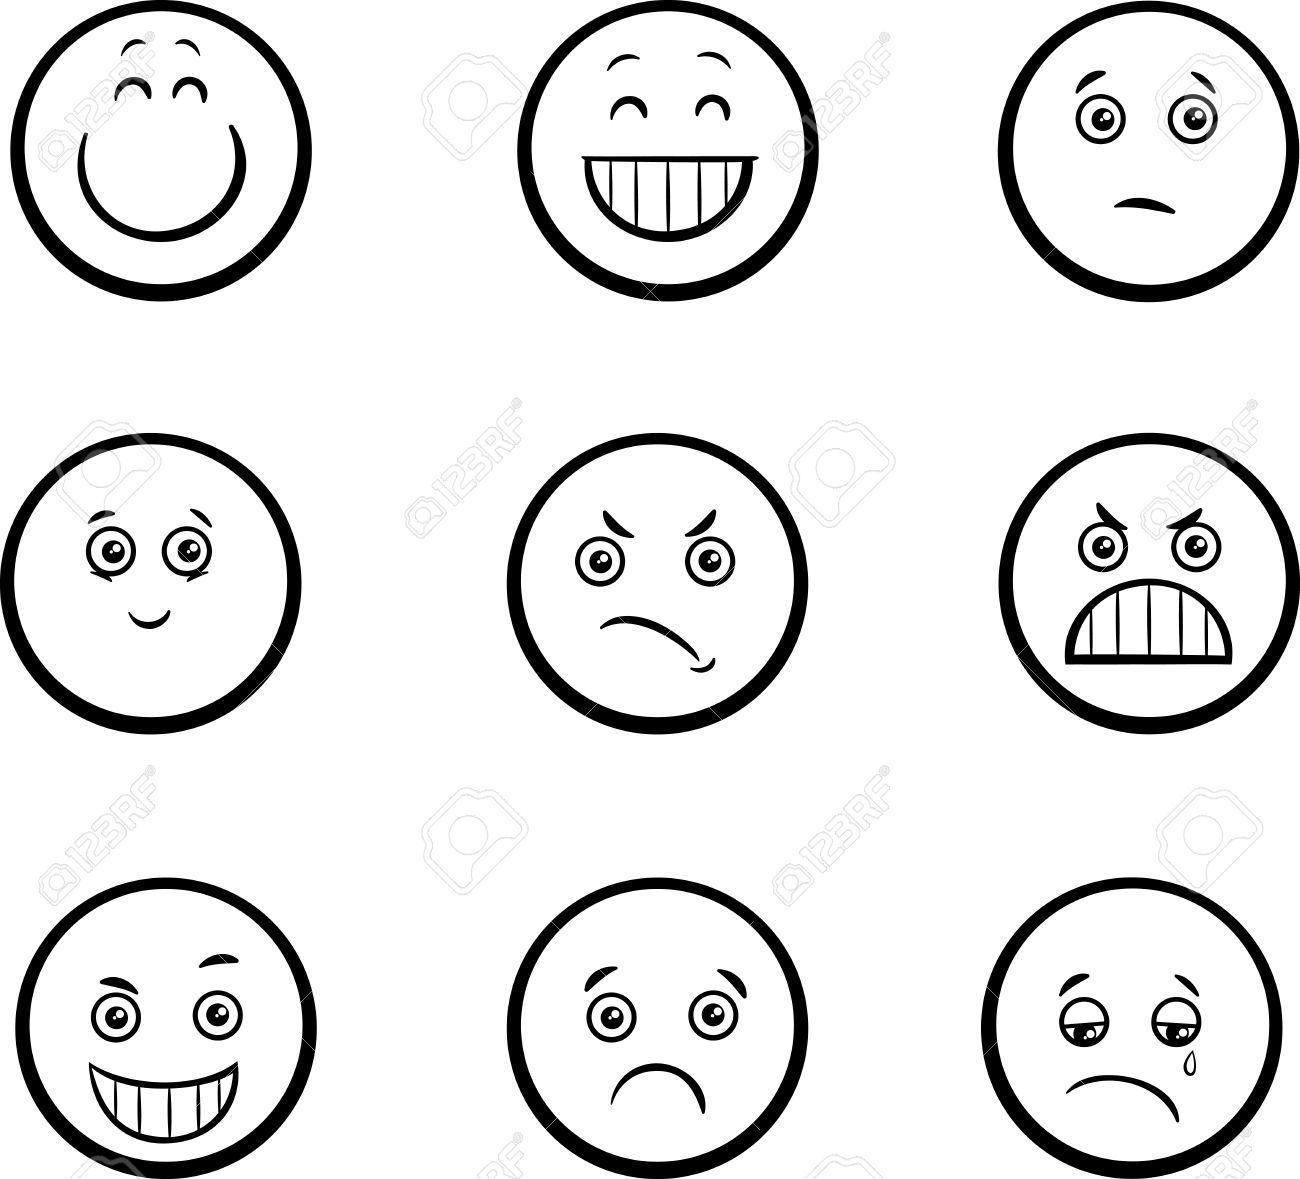 Black And White Cartoon Illustration Of Emoticon